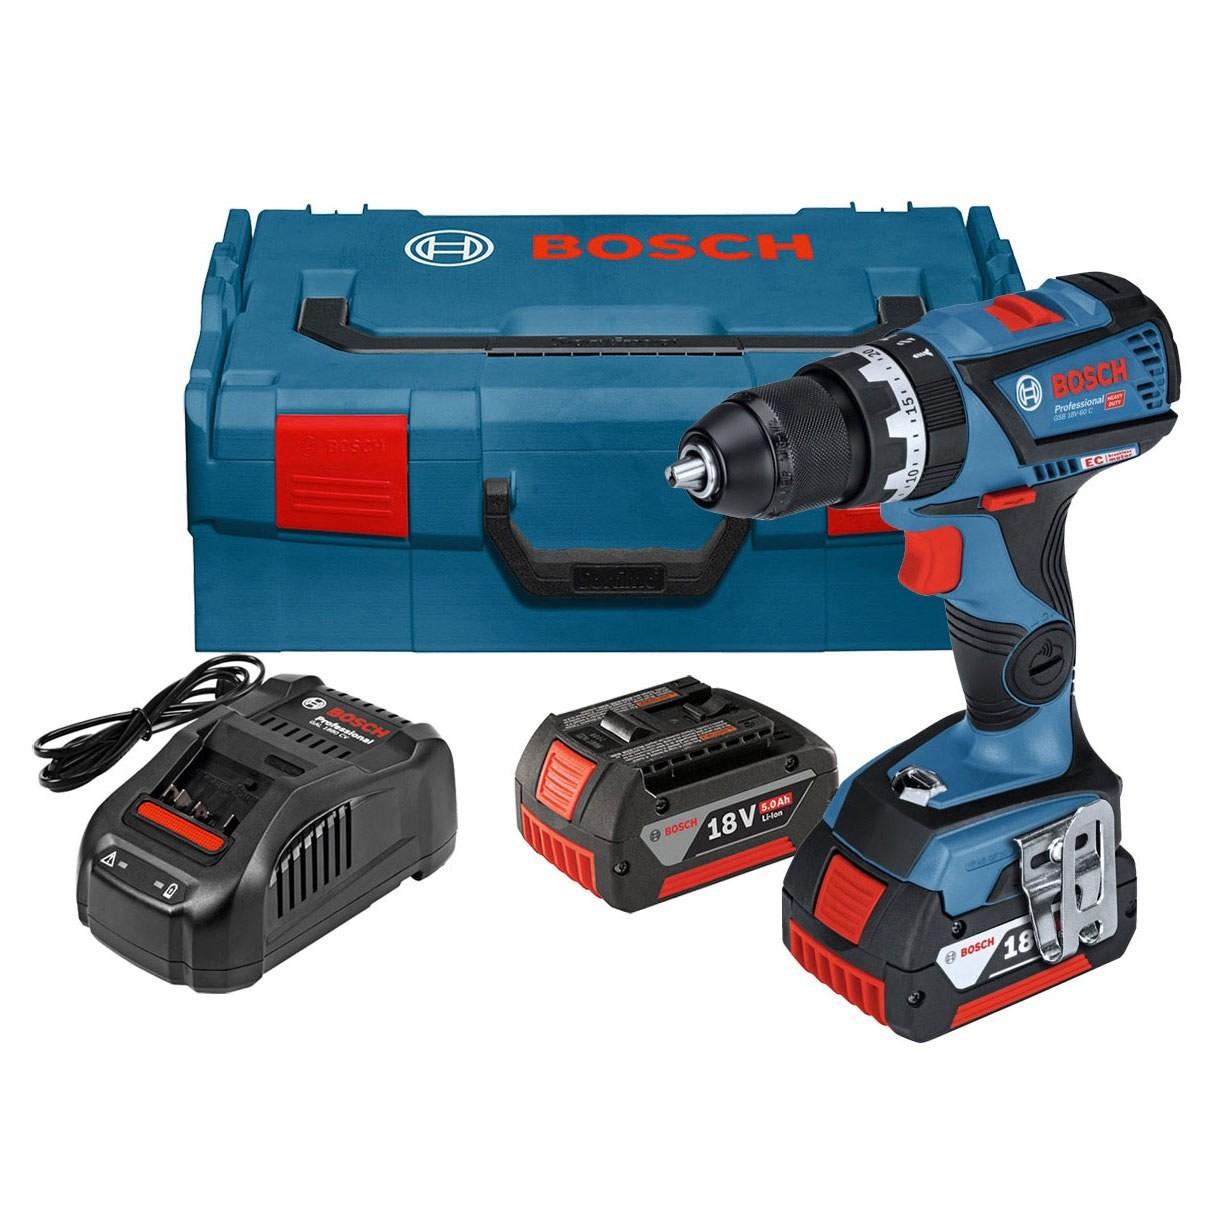 Bosch GSB 18 V-60 C Brushless Combi Drill inc 2x 5.0Ah Batteries £183.95 @ Powertoolworld